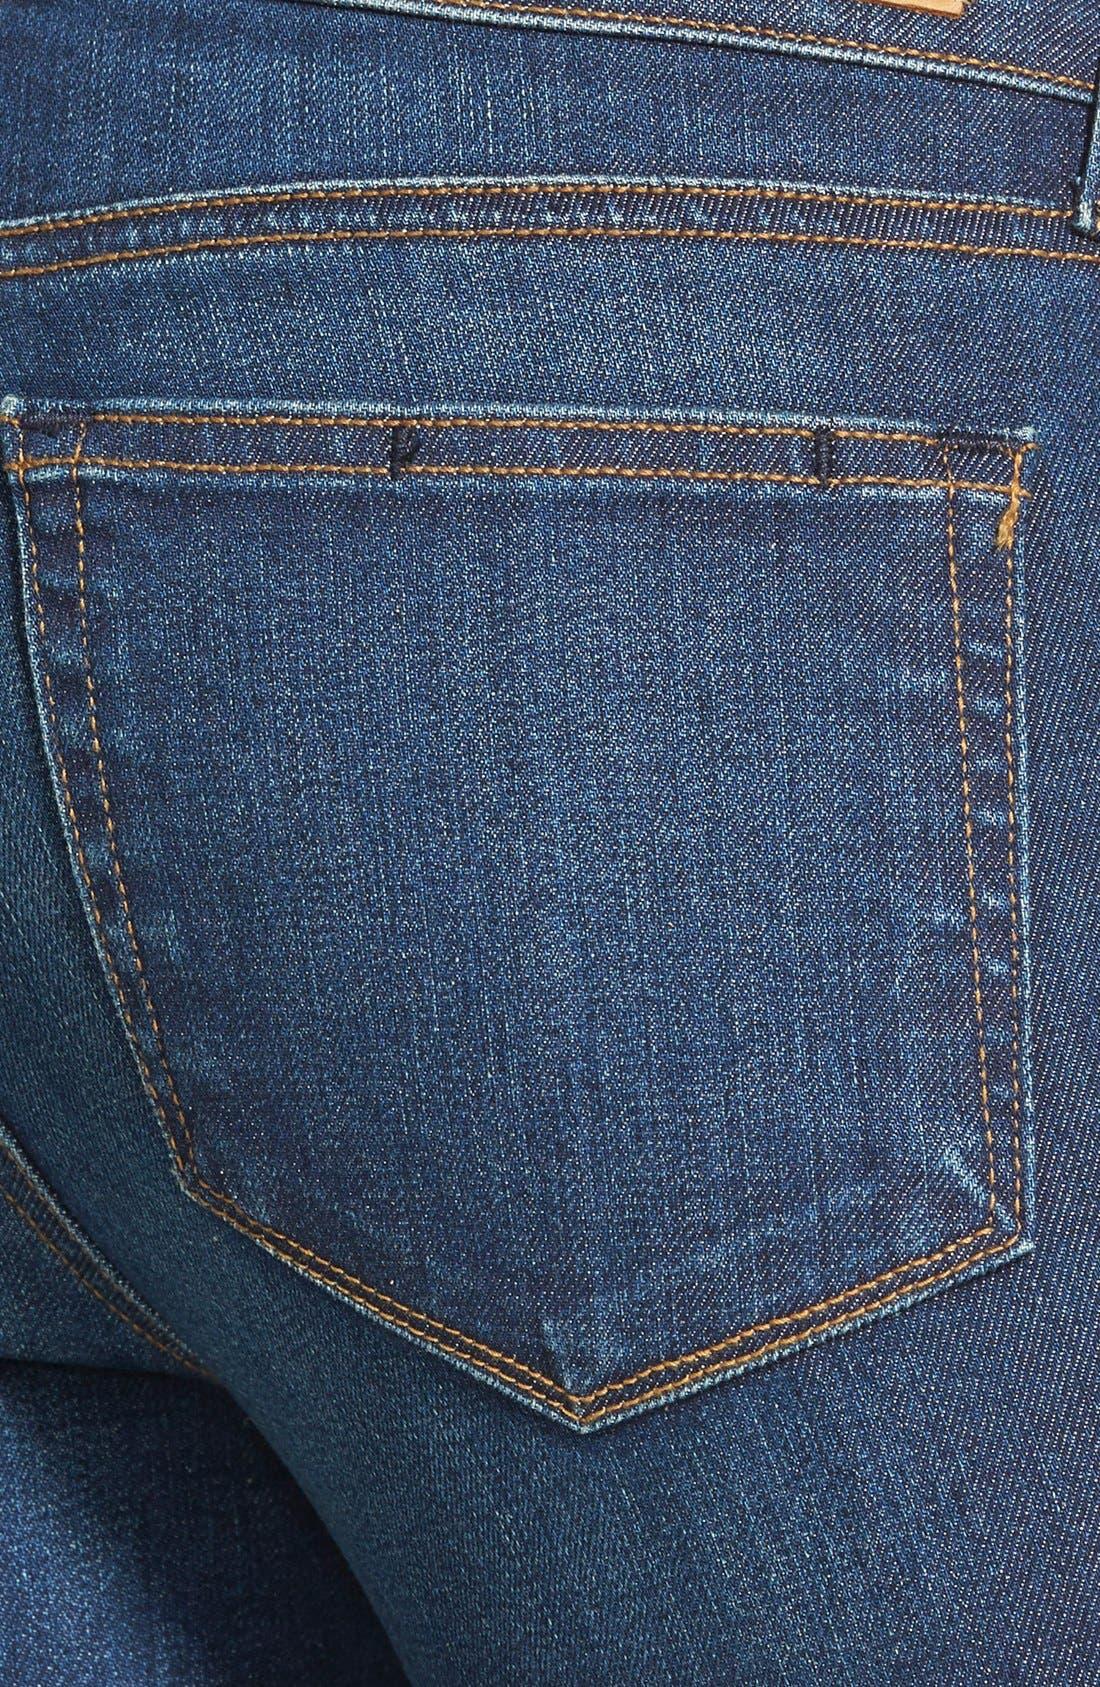 Alternate Image 3  - Paige Denim 'Skyline' Skinny Jeans (Mischa Blue)